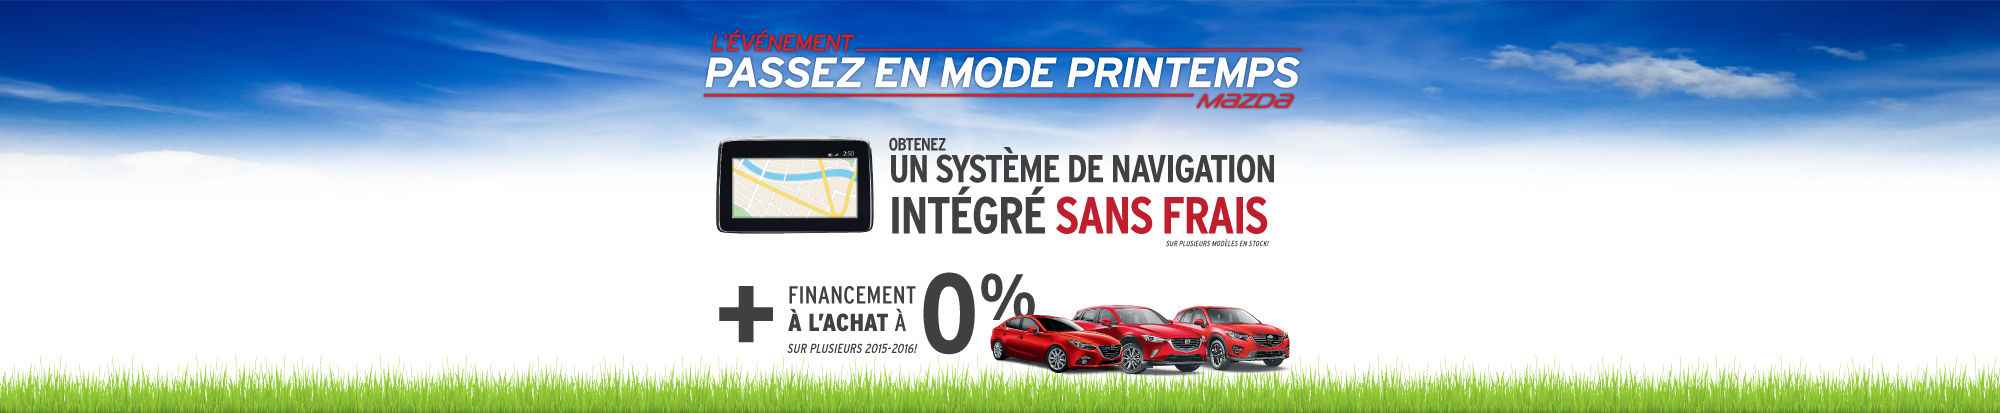 Événement passez en mode printemps Mazda